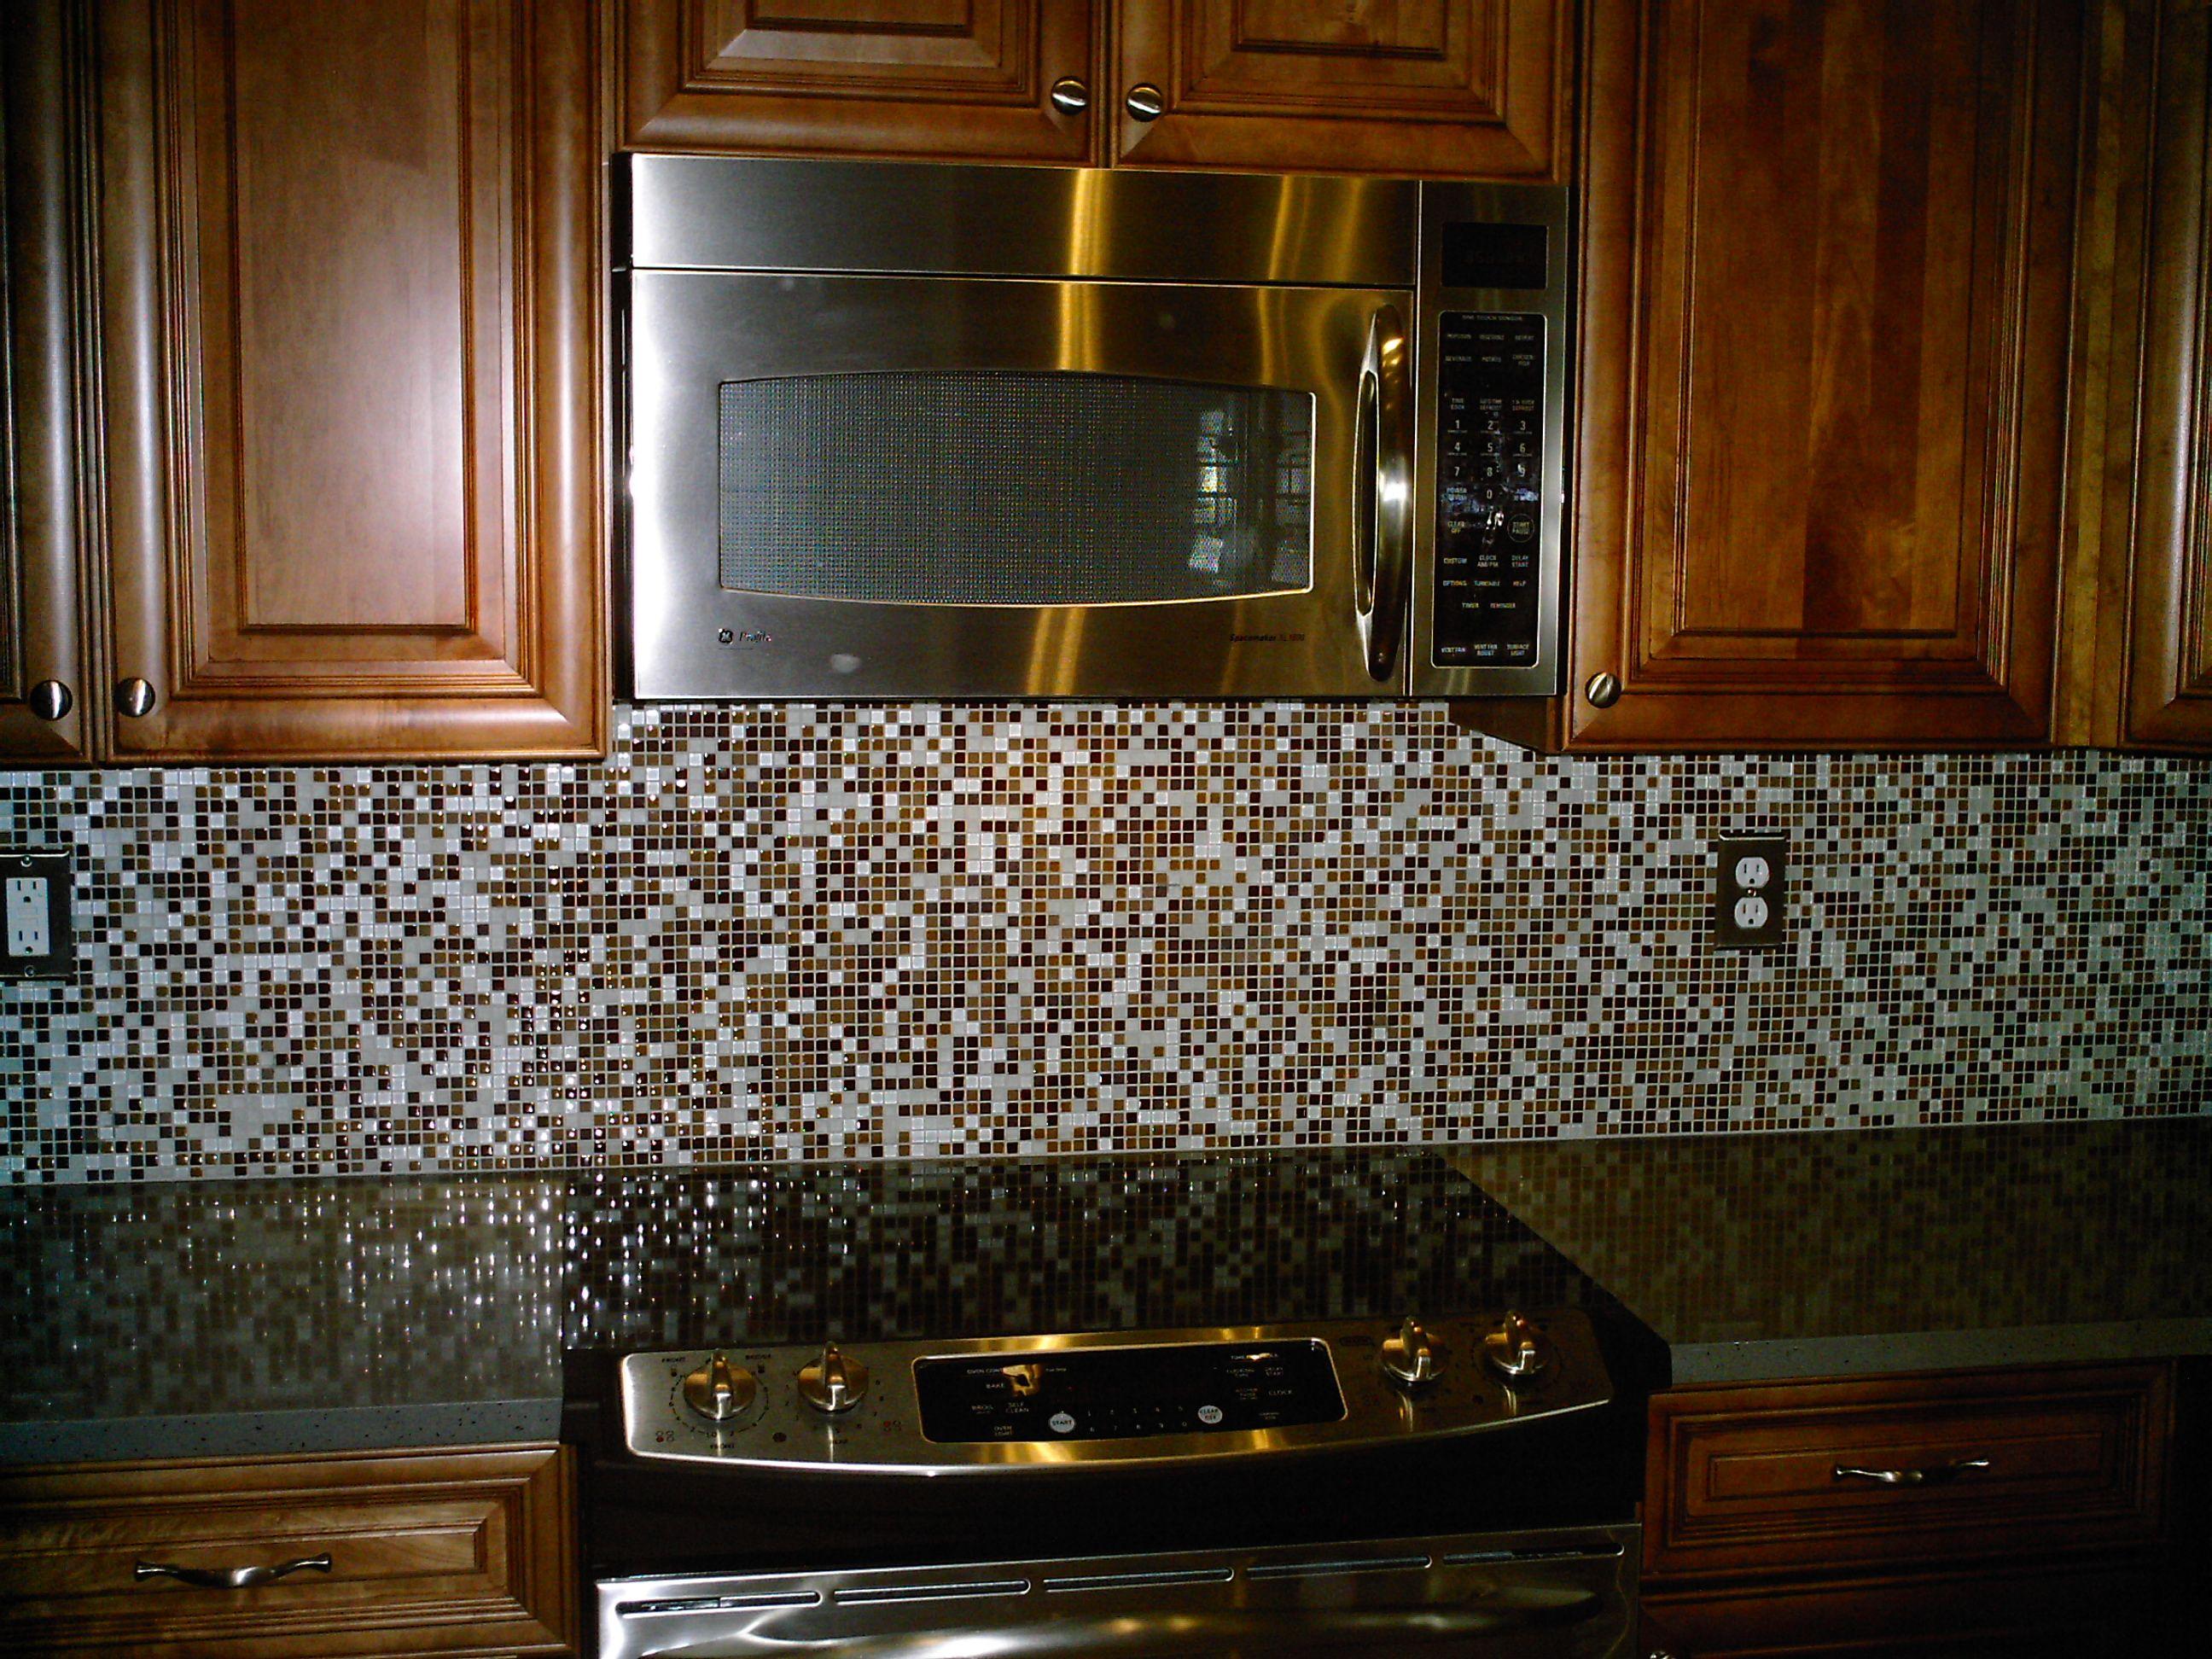 Glass Backsplash With Black Granite Top Mosaic Tile Backsplash